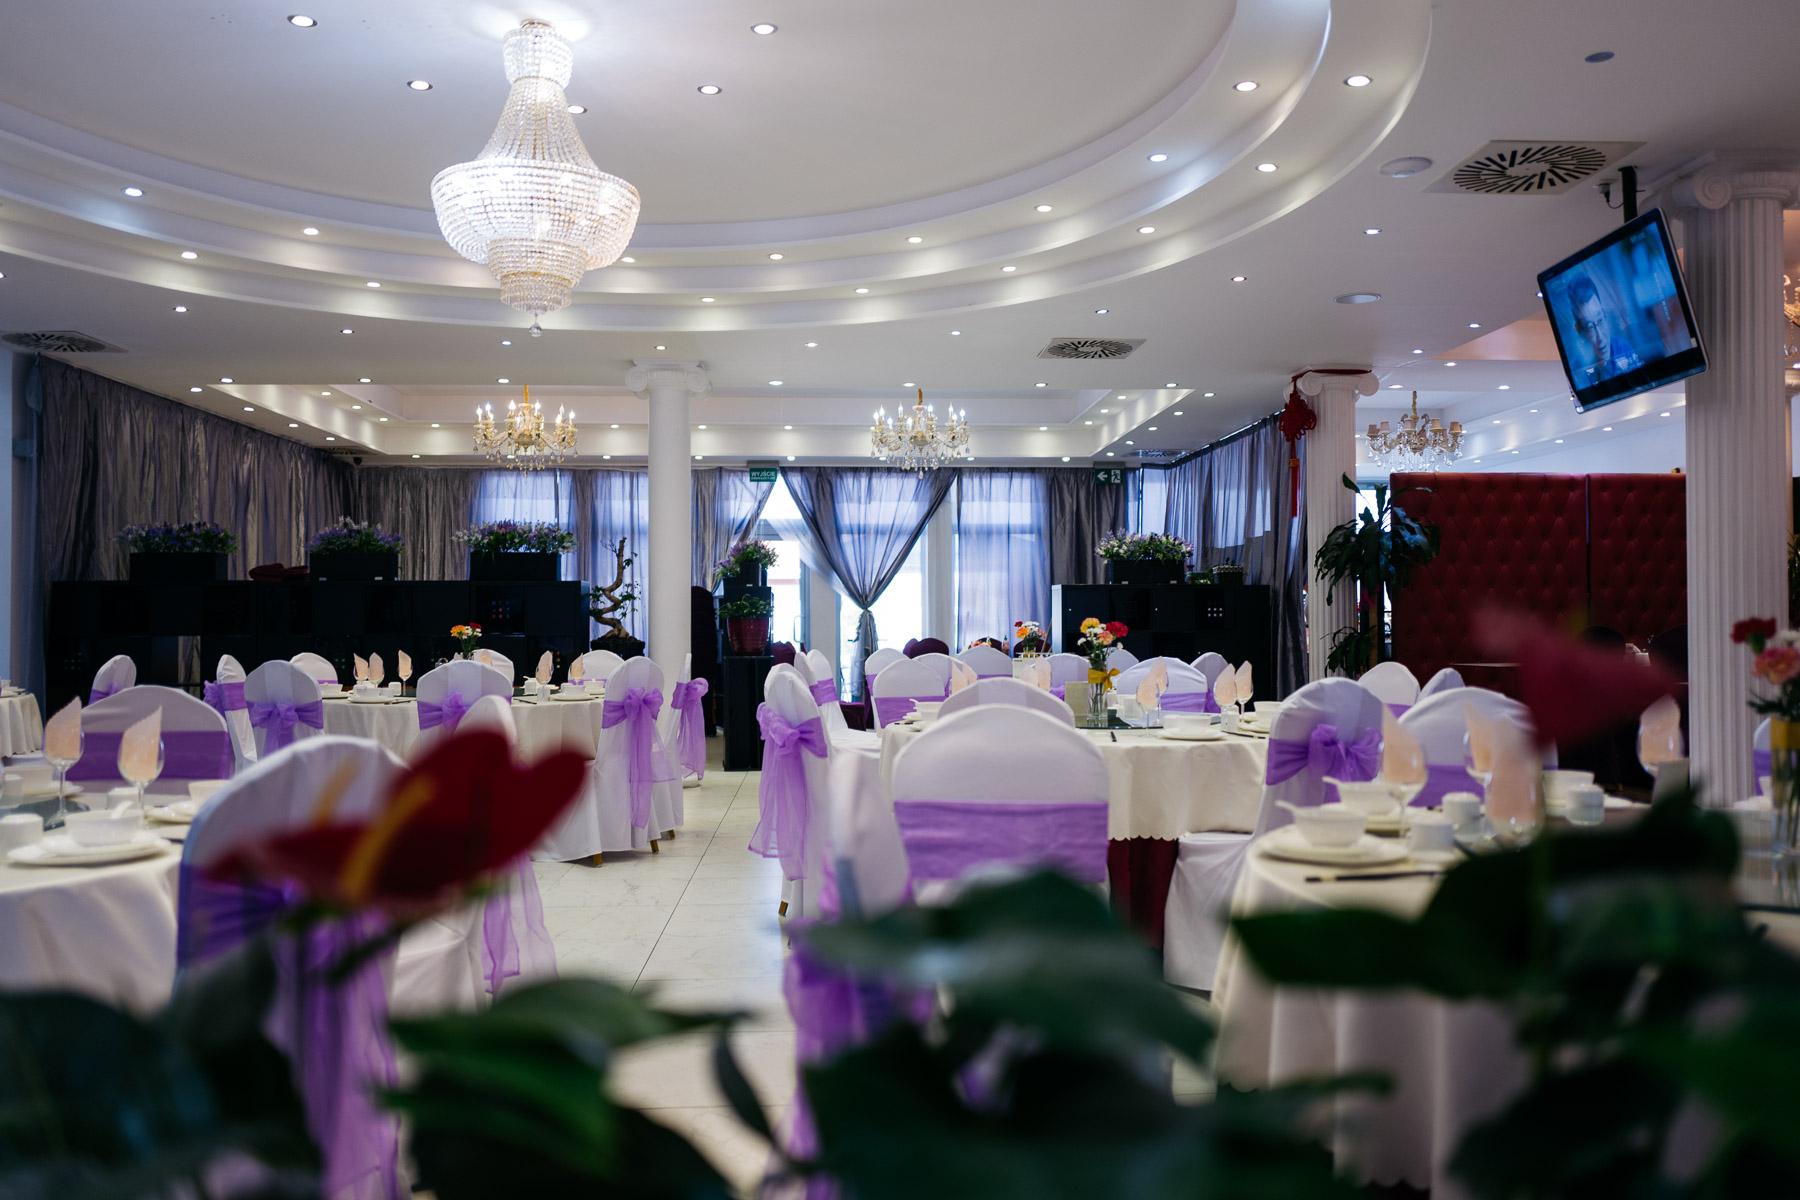 Restauracja Xing Long 兴隆酒店 Wólka Kosowska Pyza